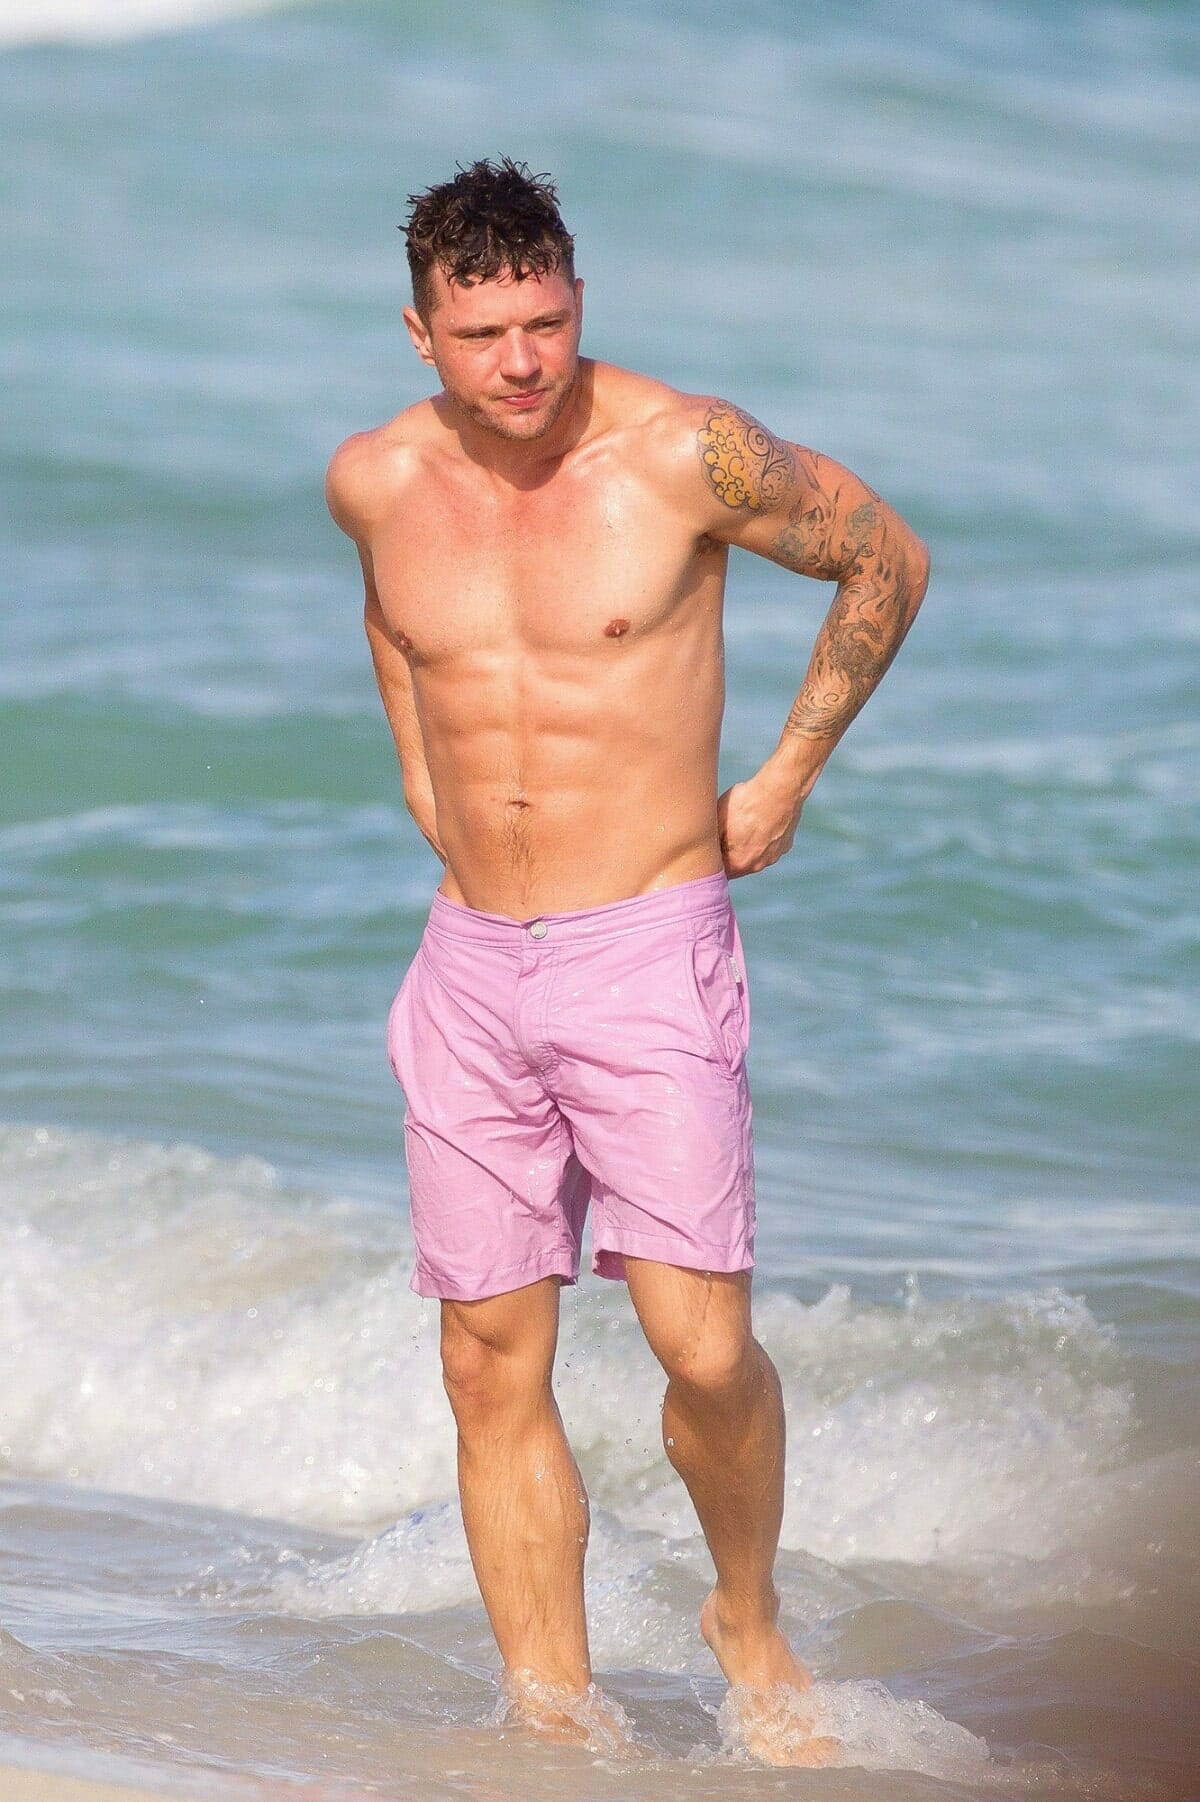 Ryan Phillippe naked shirtless pics (4)